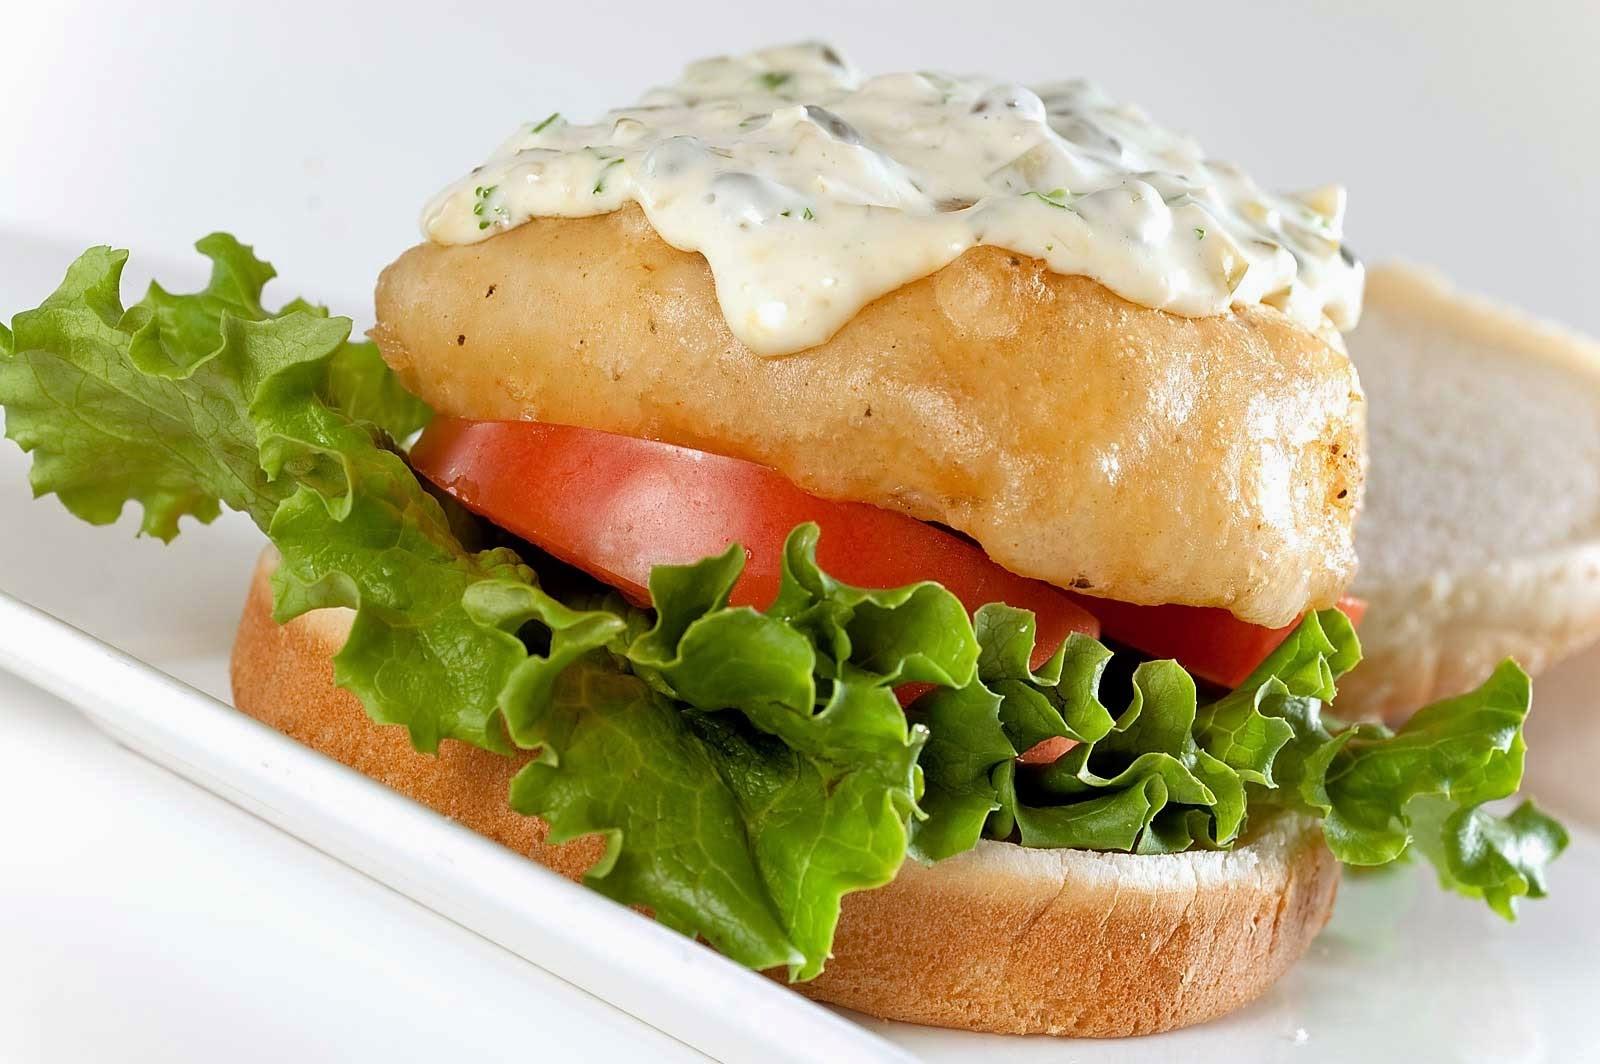 Sandwiches for Fish stick sandwich